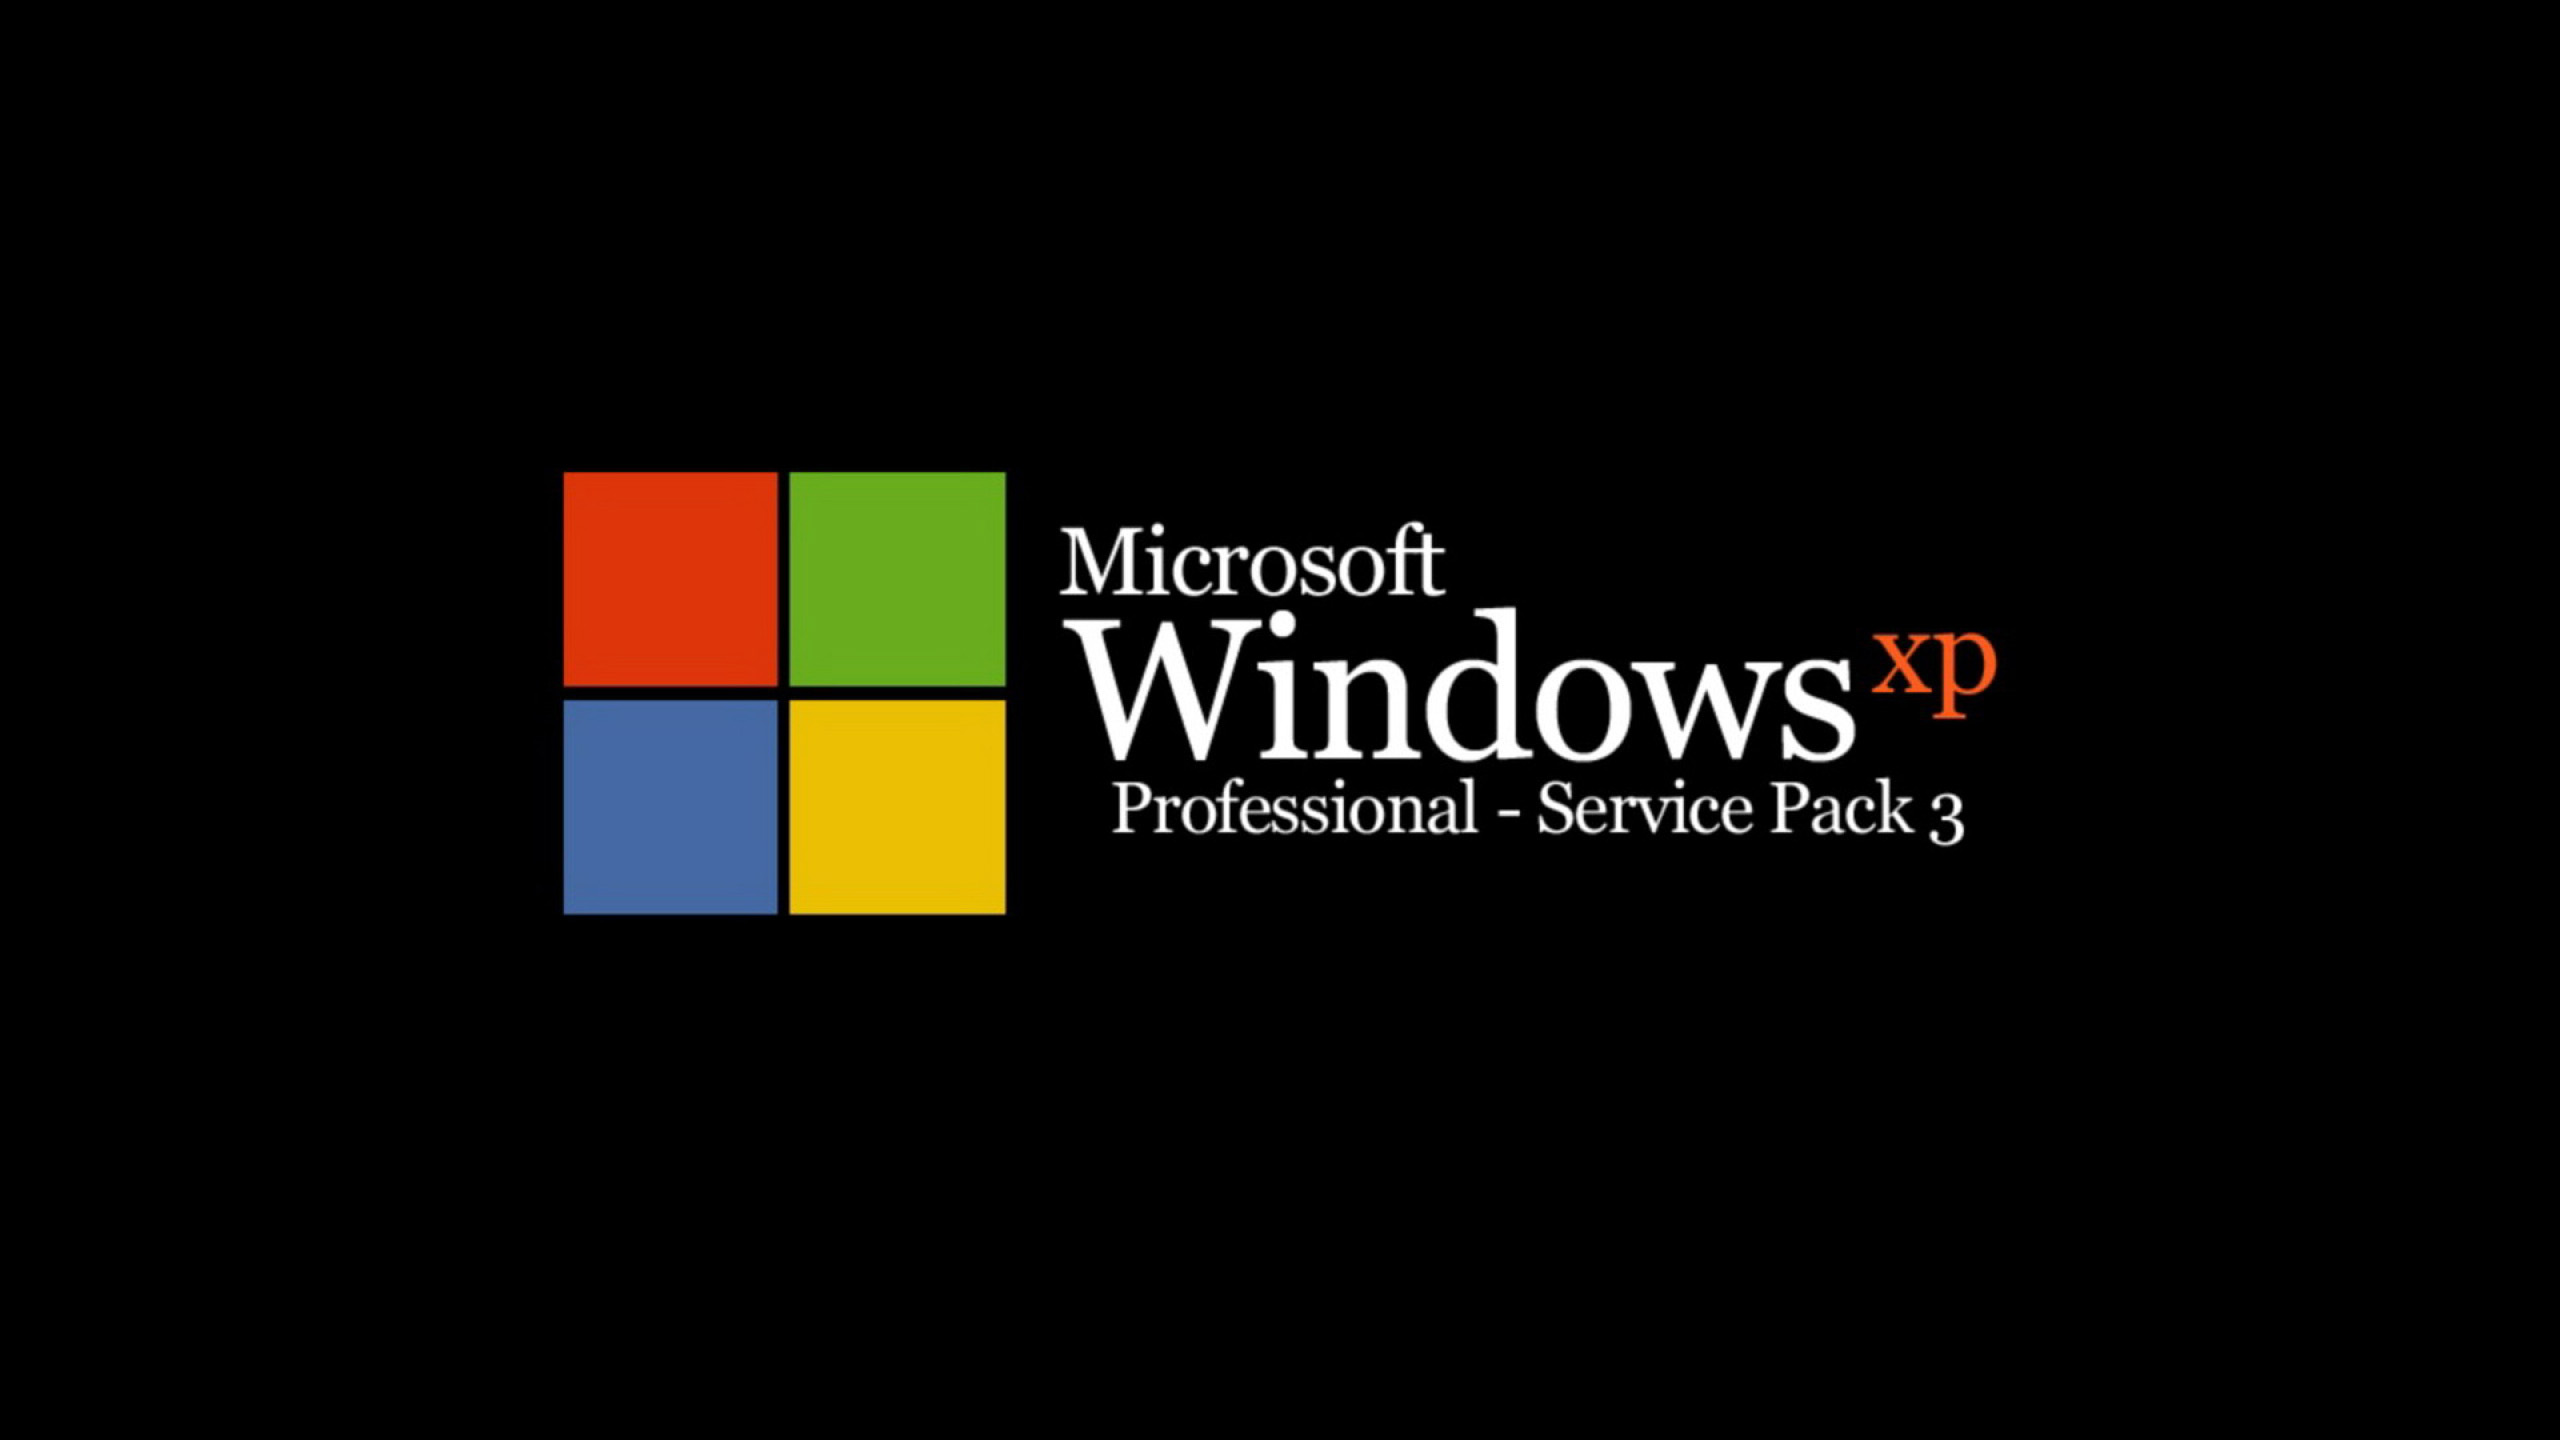 Обои windows xp, виндовс икспи, 2560 на 1440 пикселей